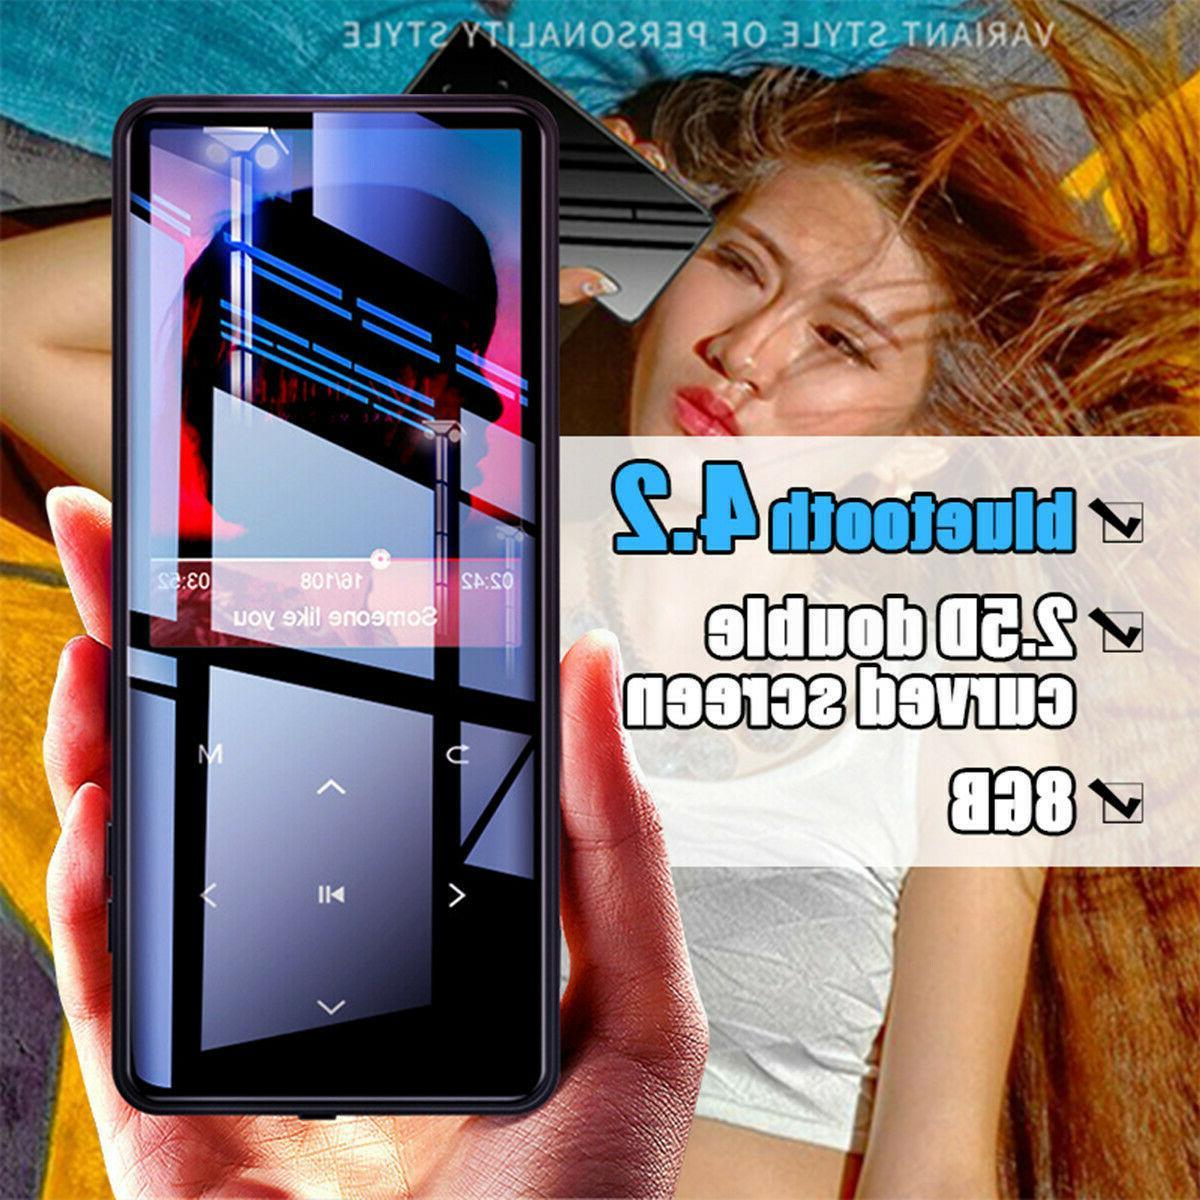 8gb portable hifi bluetooth ultrathin touch screen